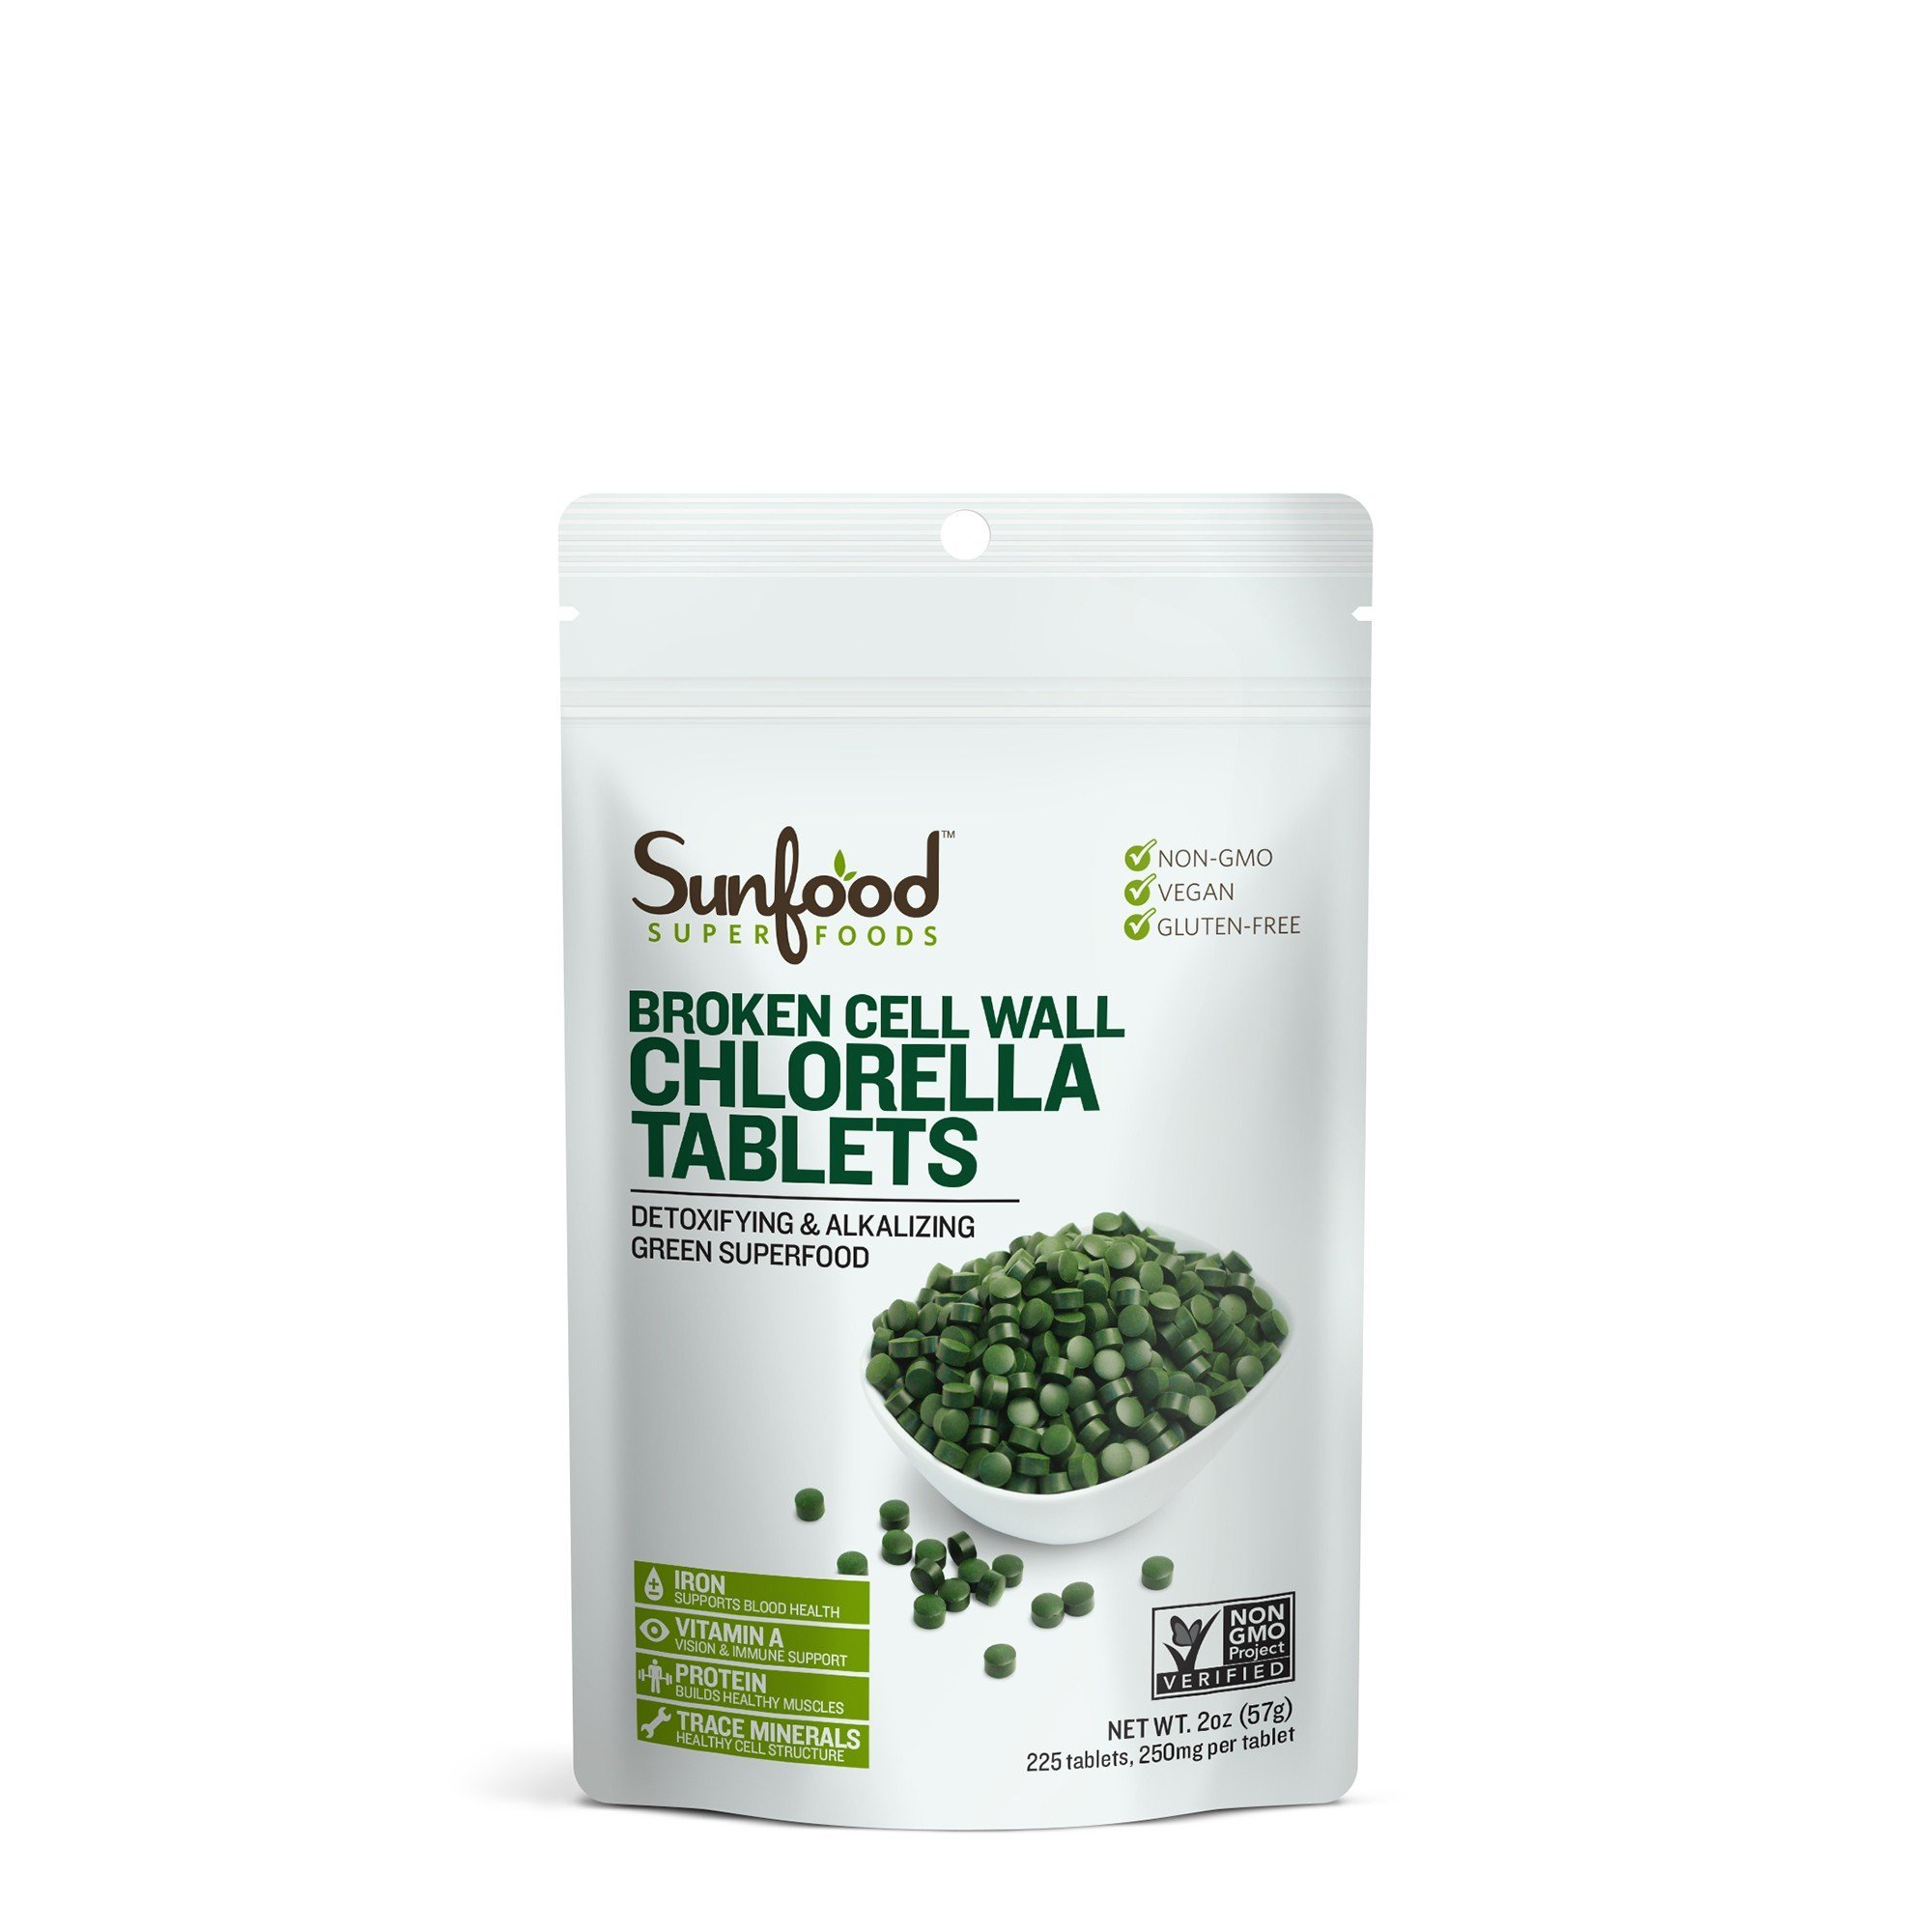 Sunfood Chlorella Tablets, 2oz (250mg per tablet / 225 tablets)